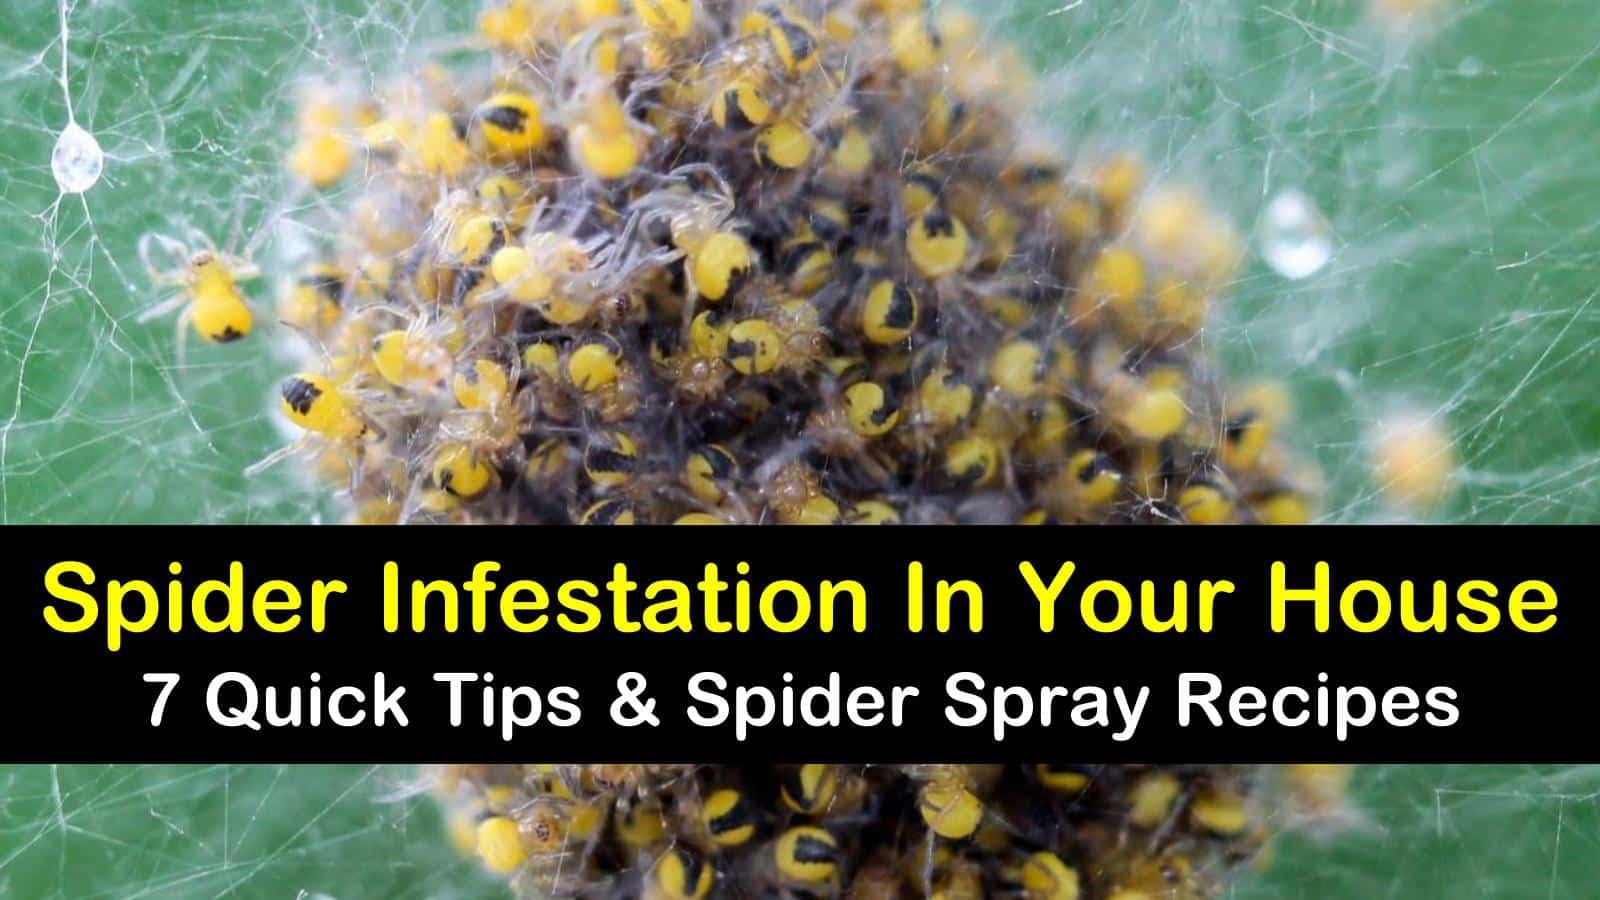 spider infestation in house titleimg1